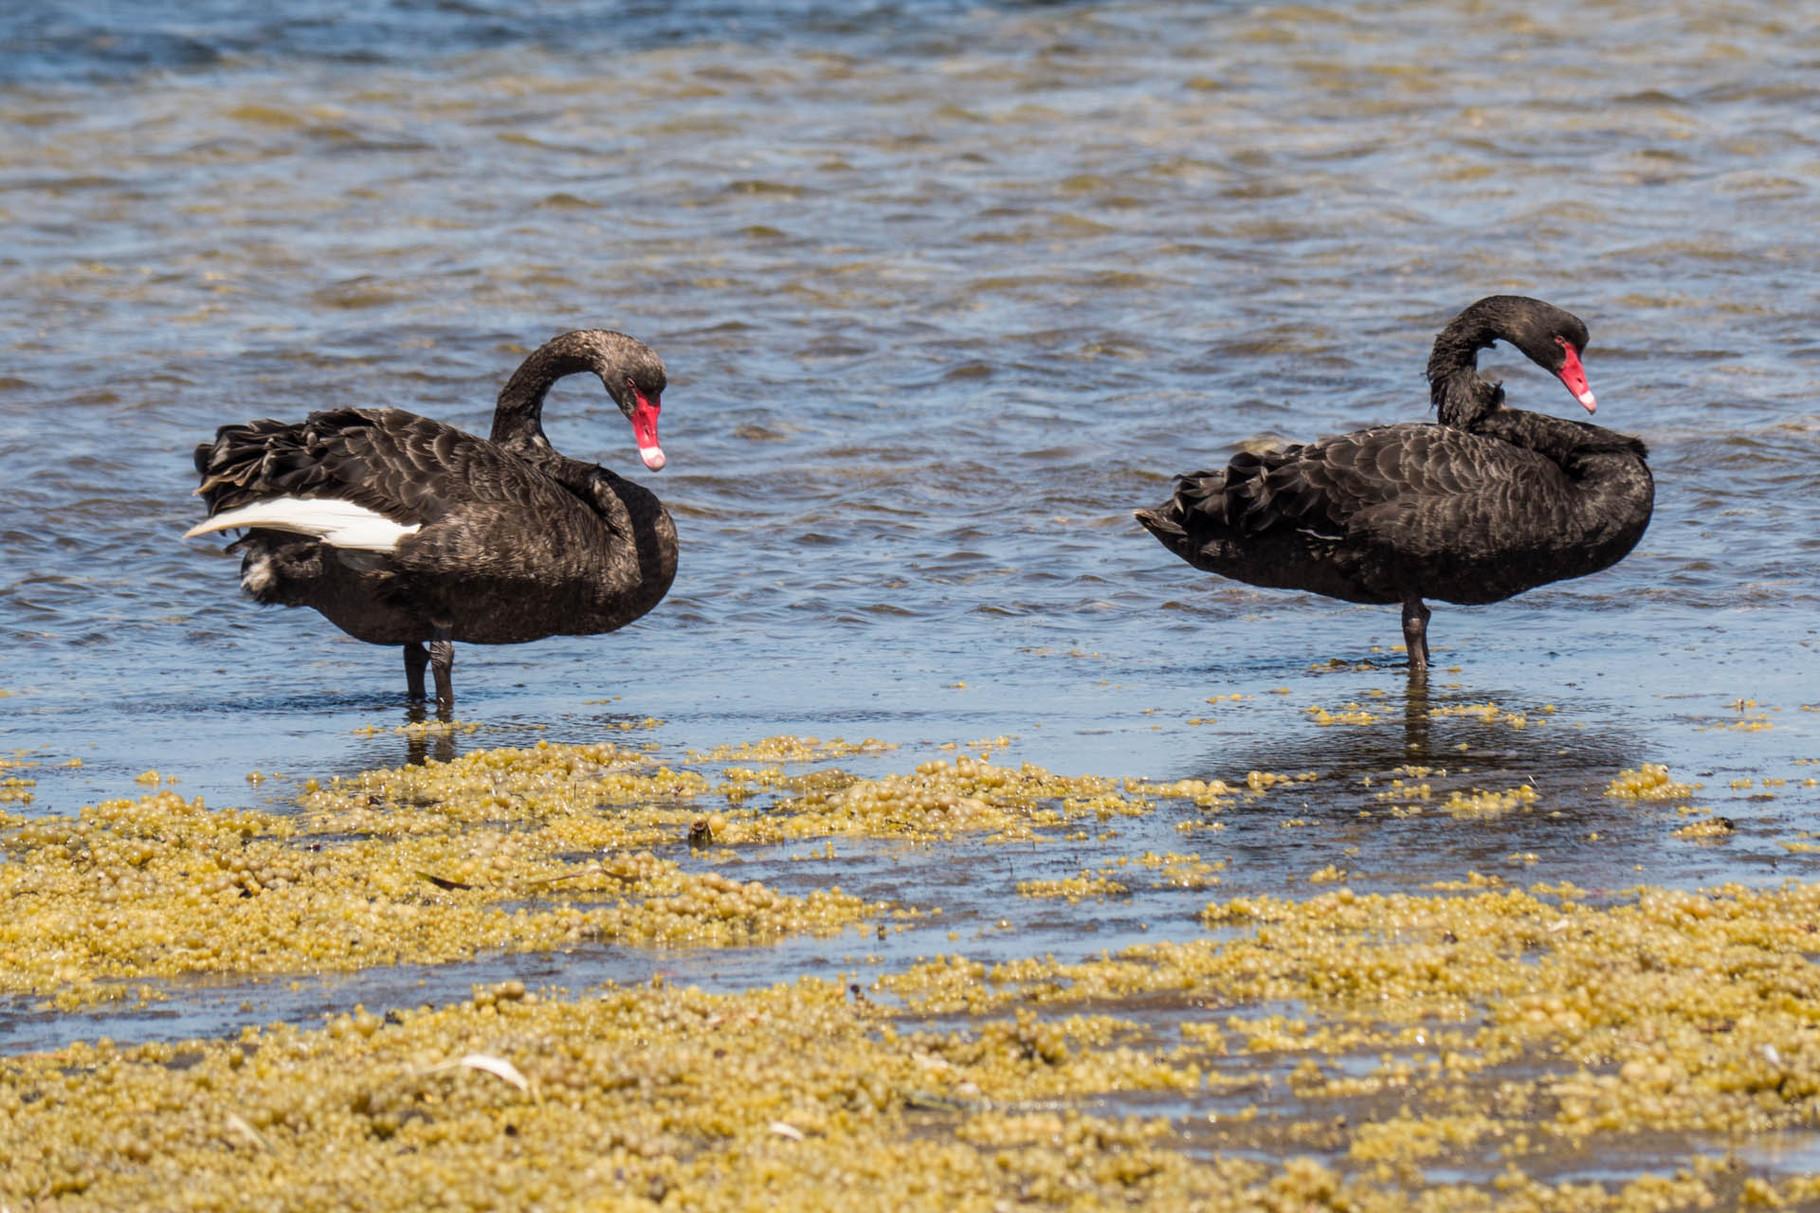 Black Swans, American River, Kangaroo Island [Australia, 2014]